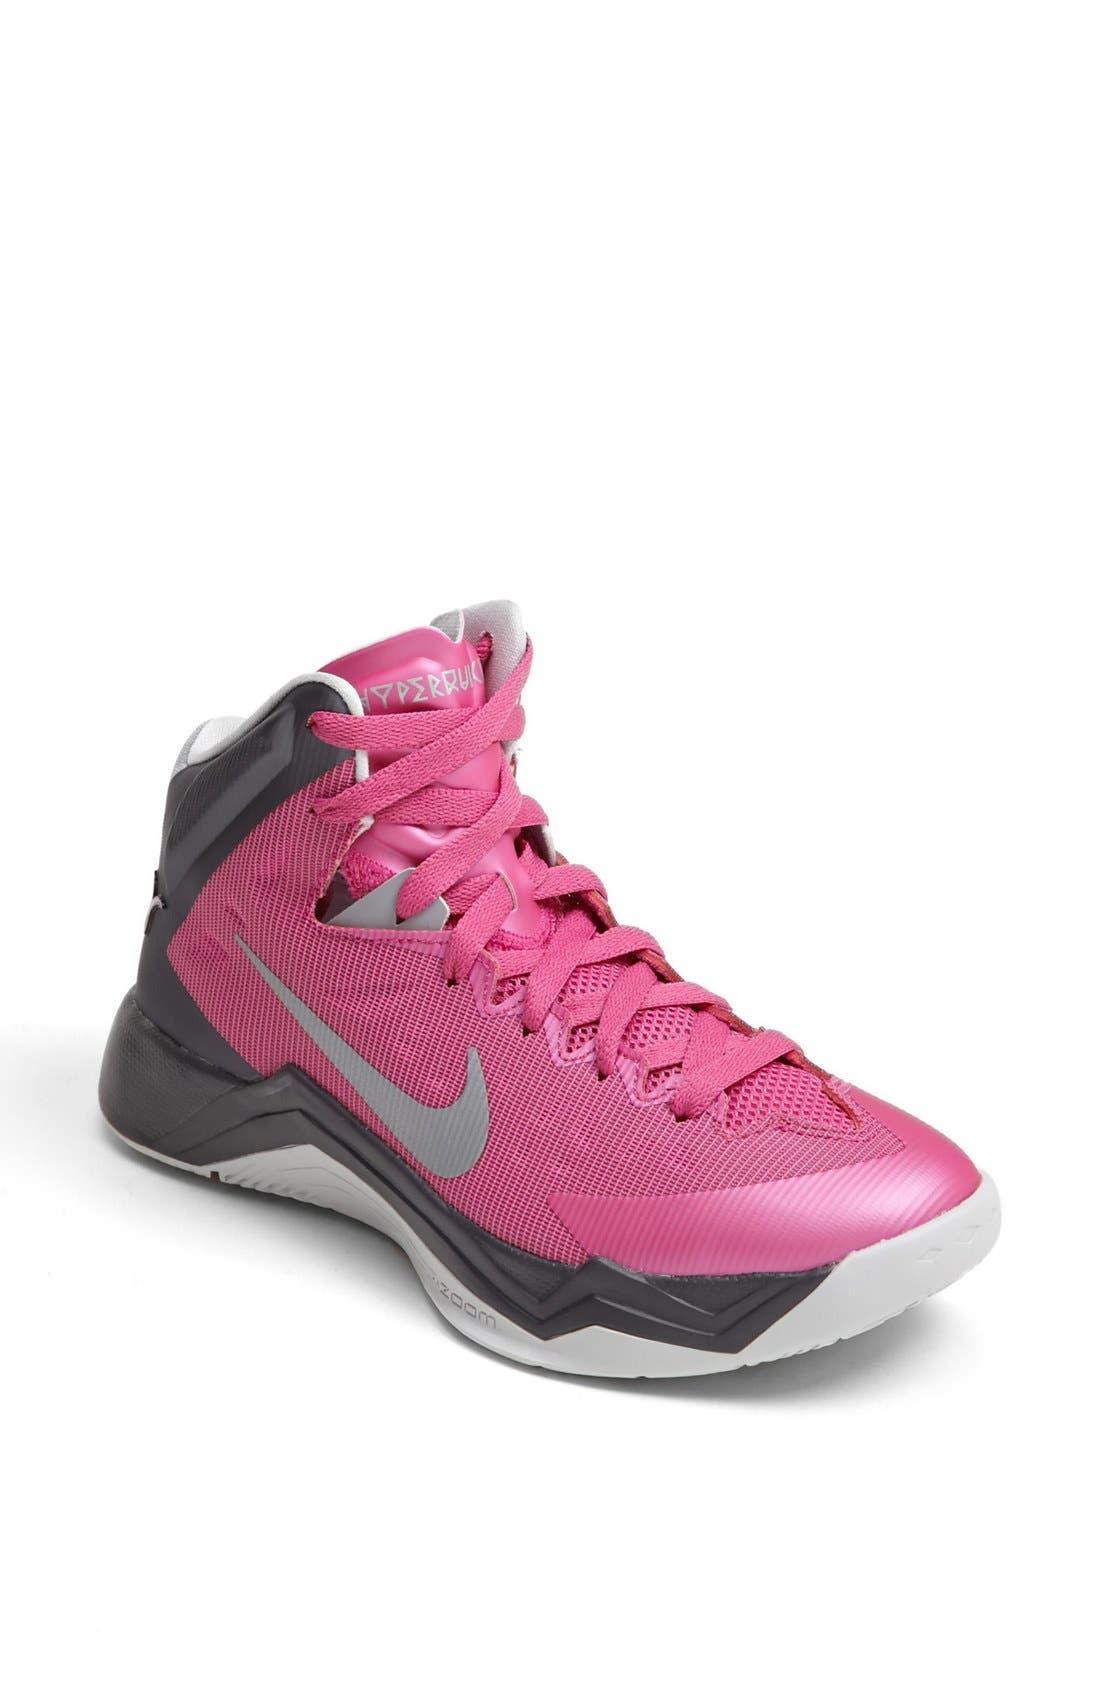 Alternate Image 1 Selected - Nike 'Hyper Quickness' Basketball Shoe (Women)